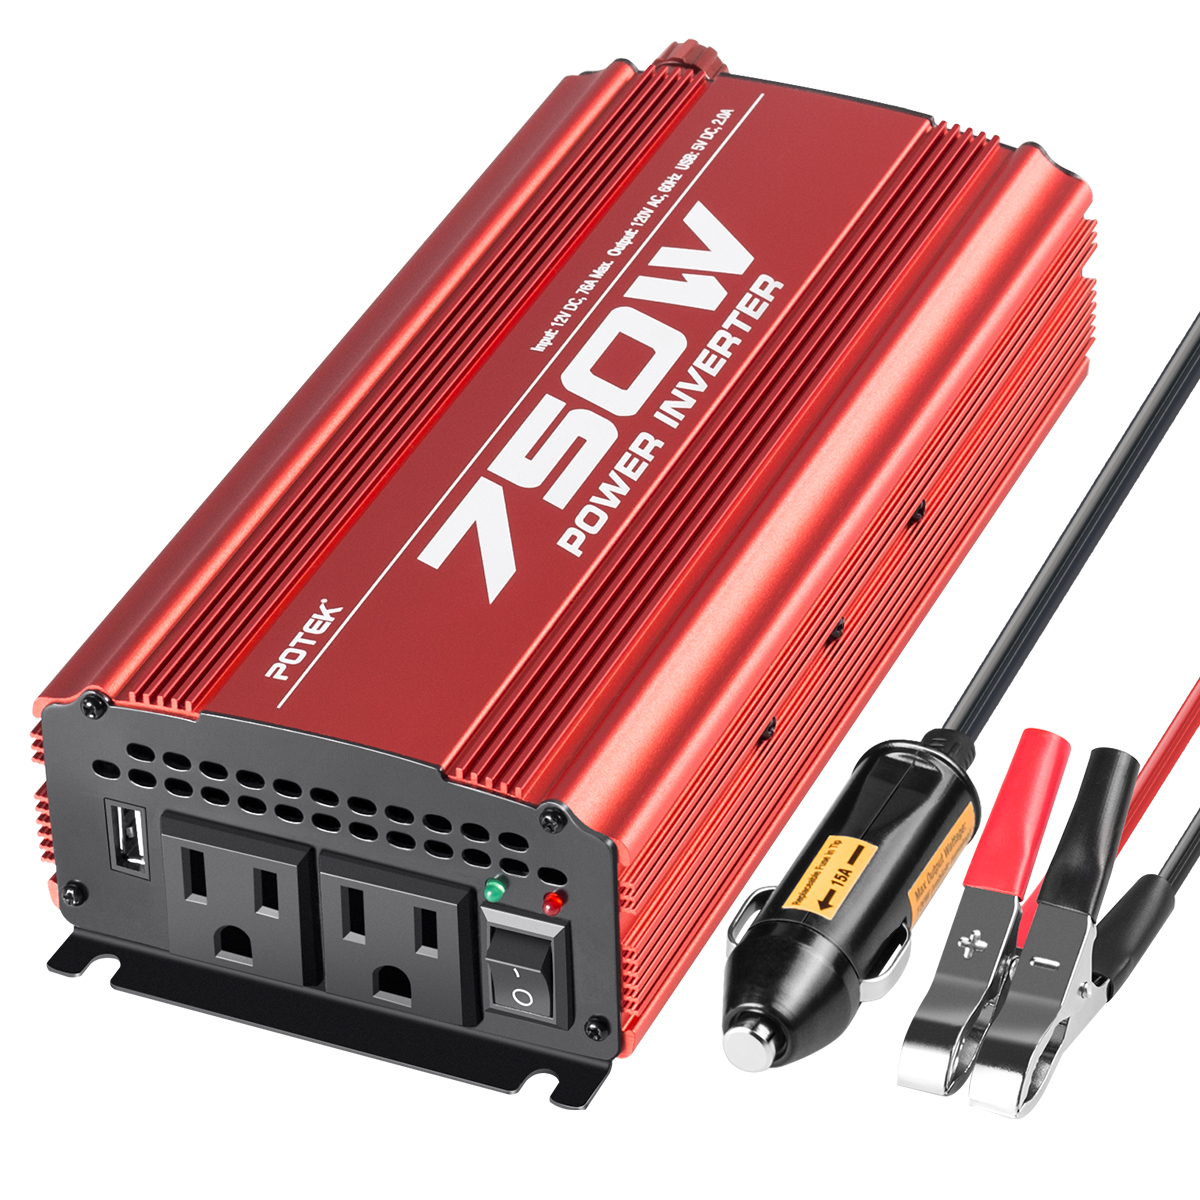 Electronicks New 750 Watt Continuous 1500 Watt Peak 12V to 115V Power Inverter